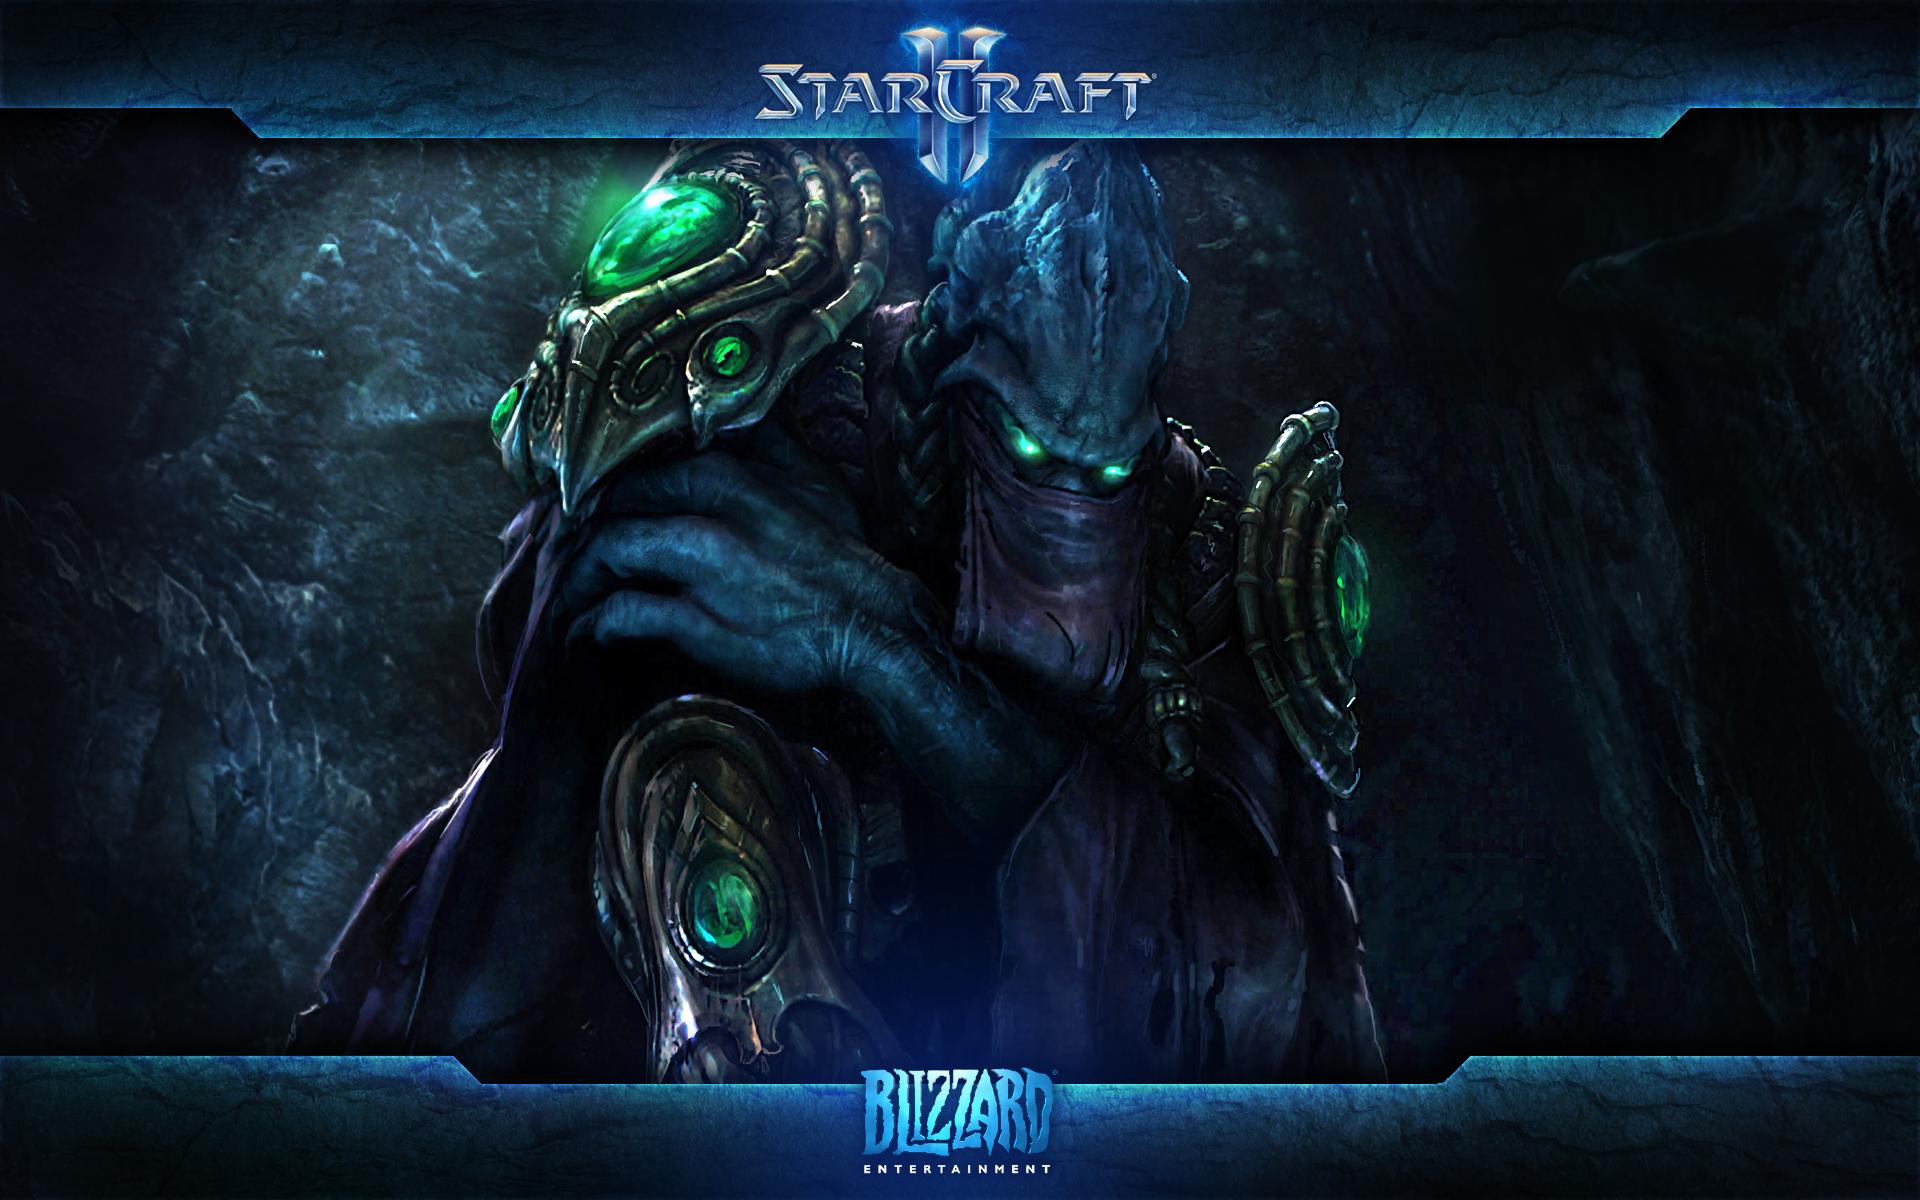 Starcraft HD Desktop Wallpapers for